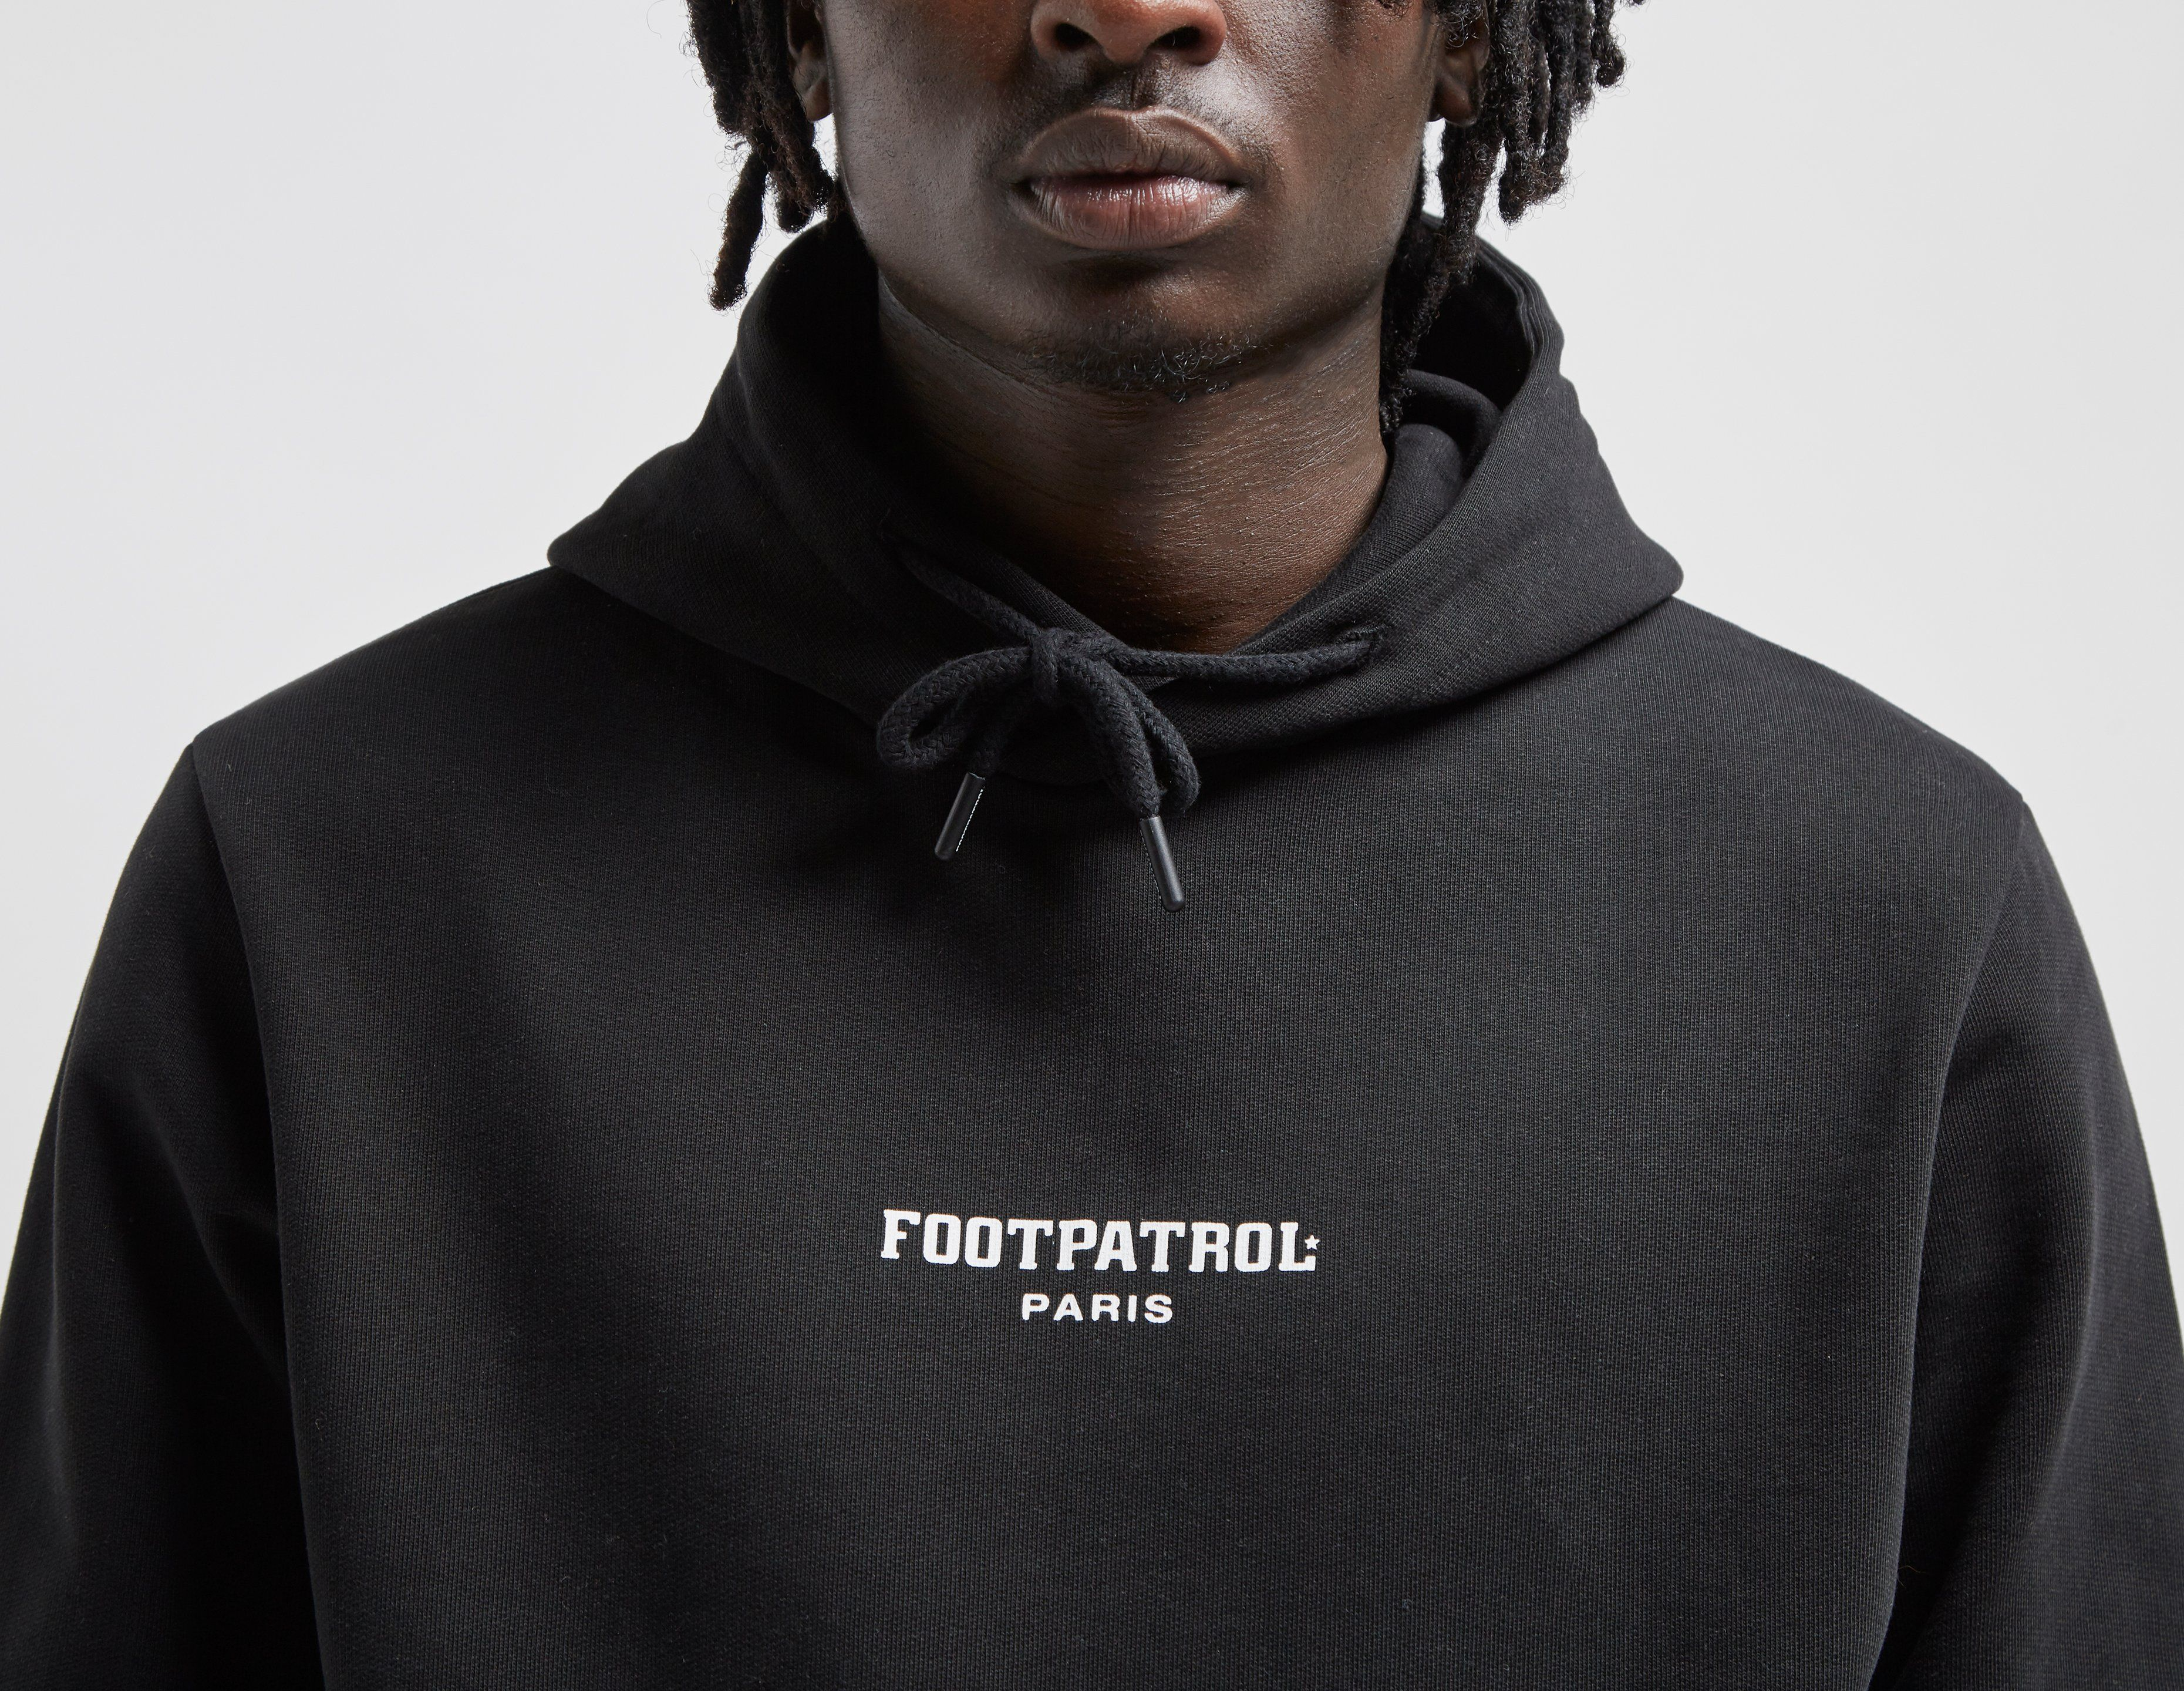 Footpatrol Paris Bar Logo Hoody